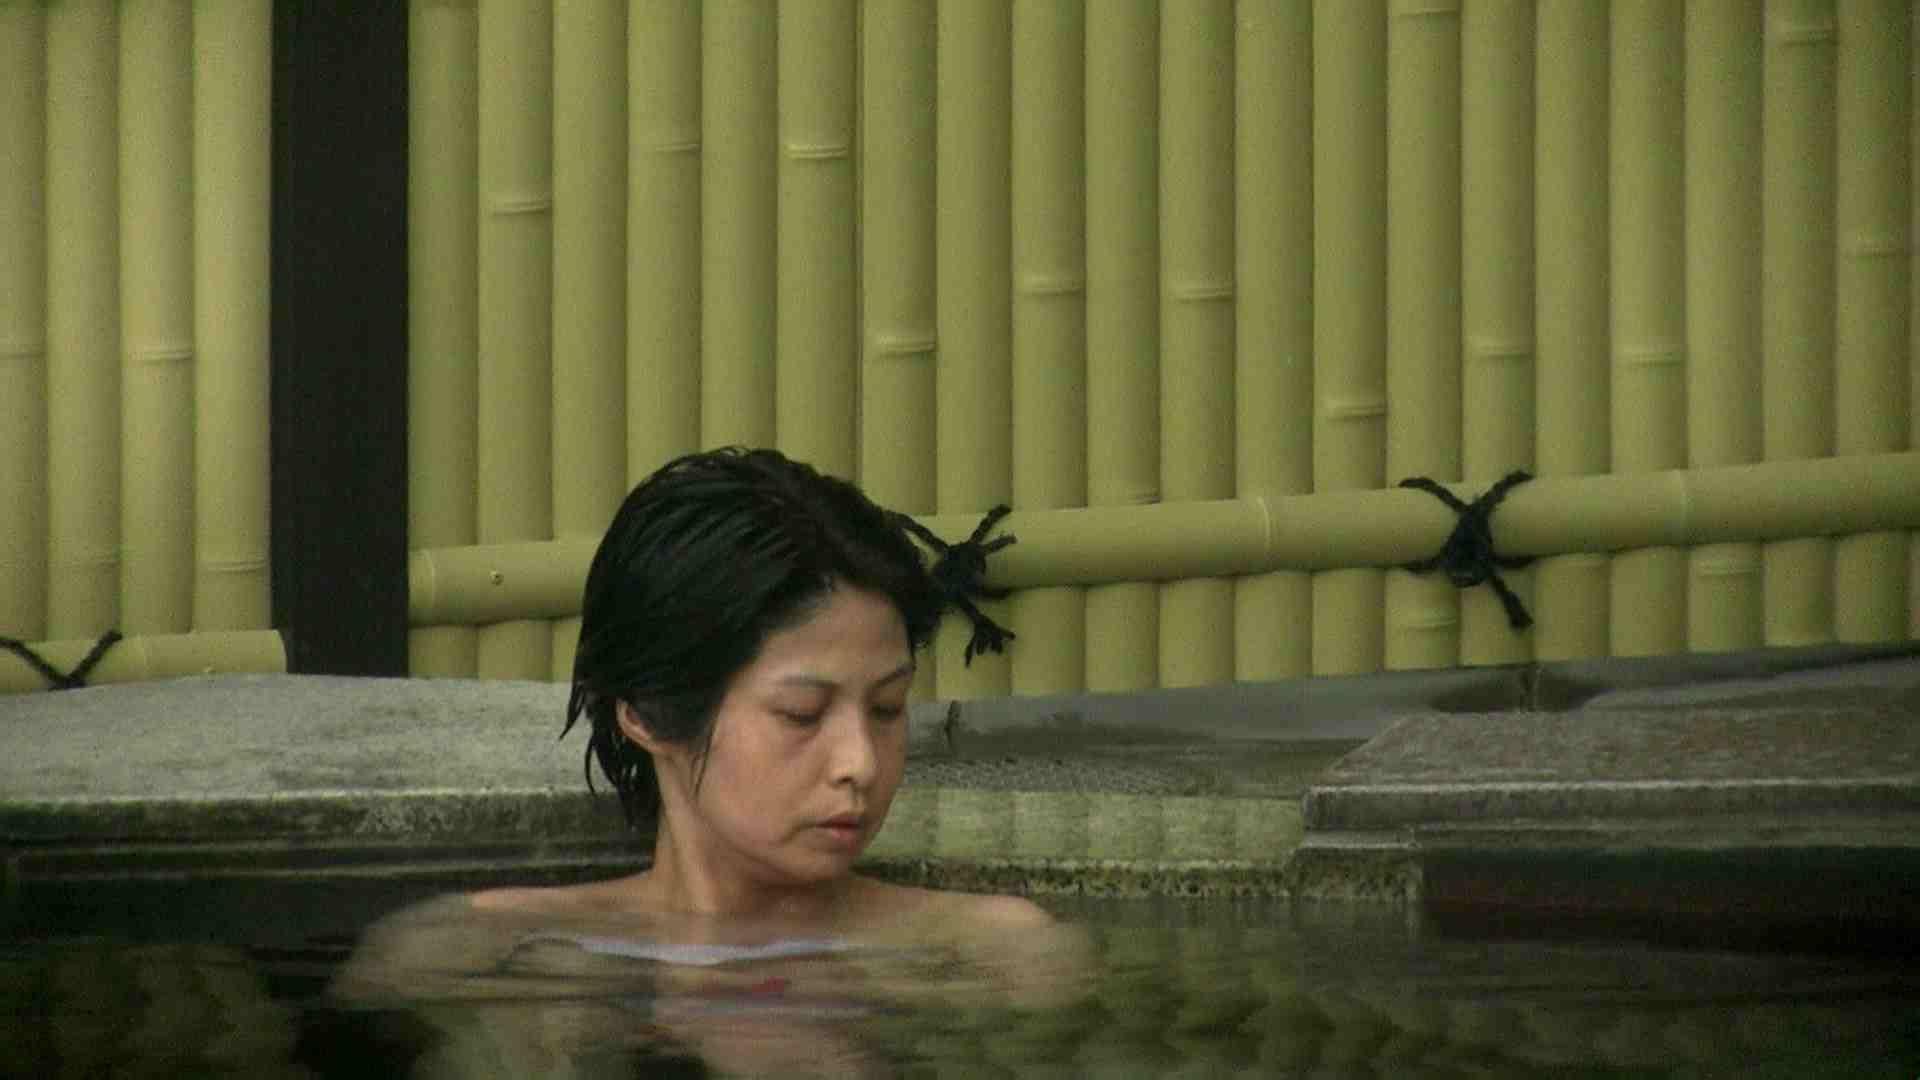 Aquaな露天風呂Vol.636 HなOL | 盗撮  82pic 5